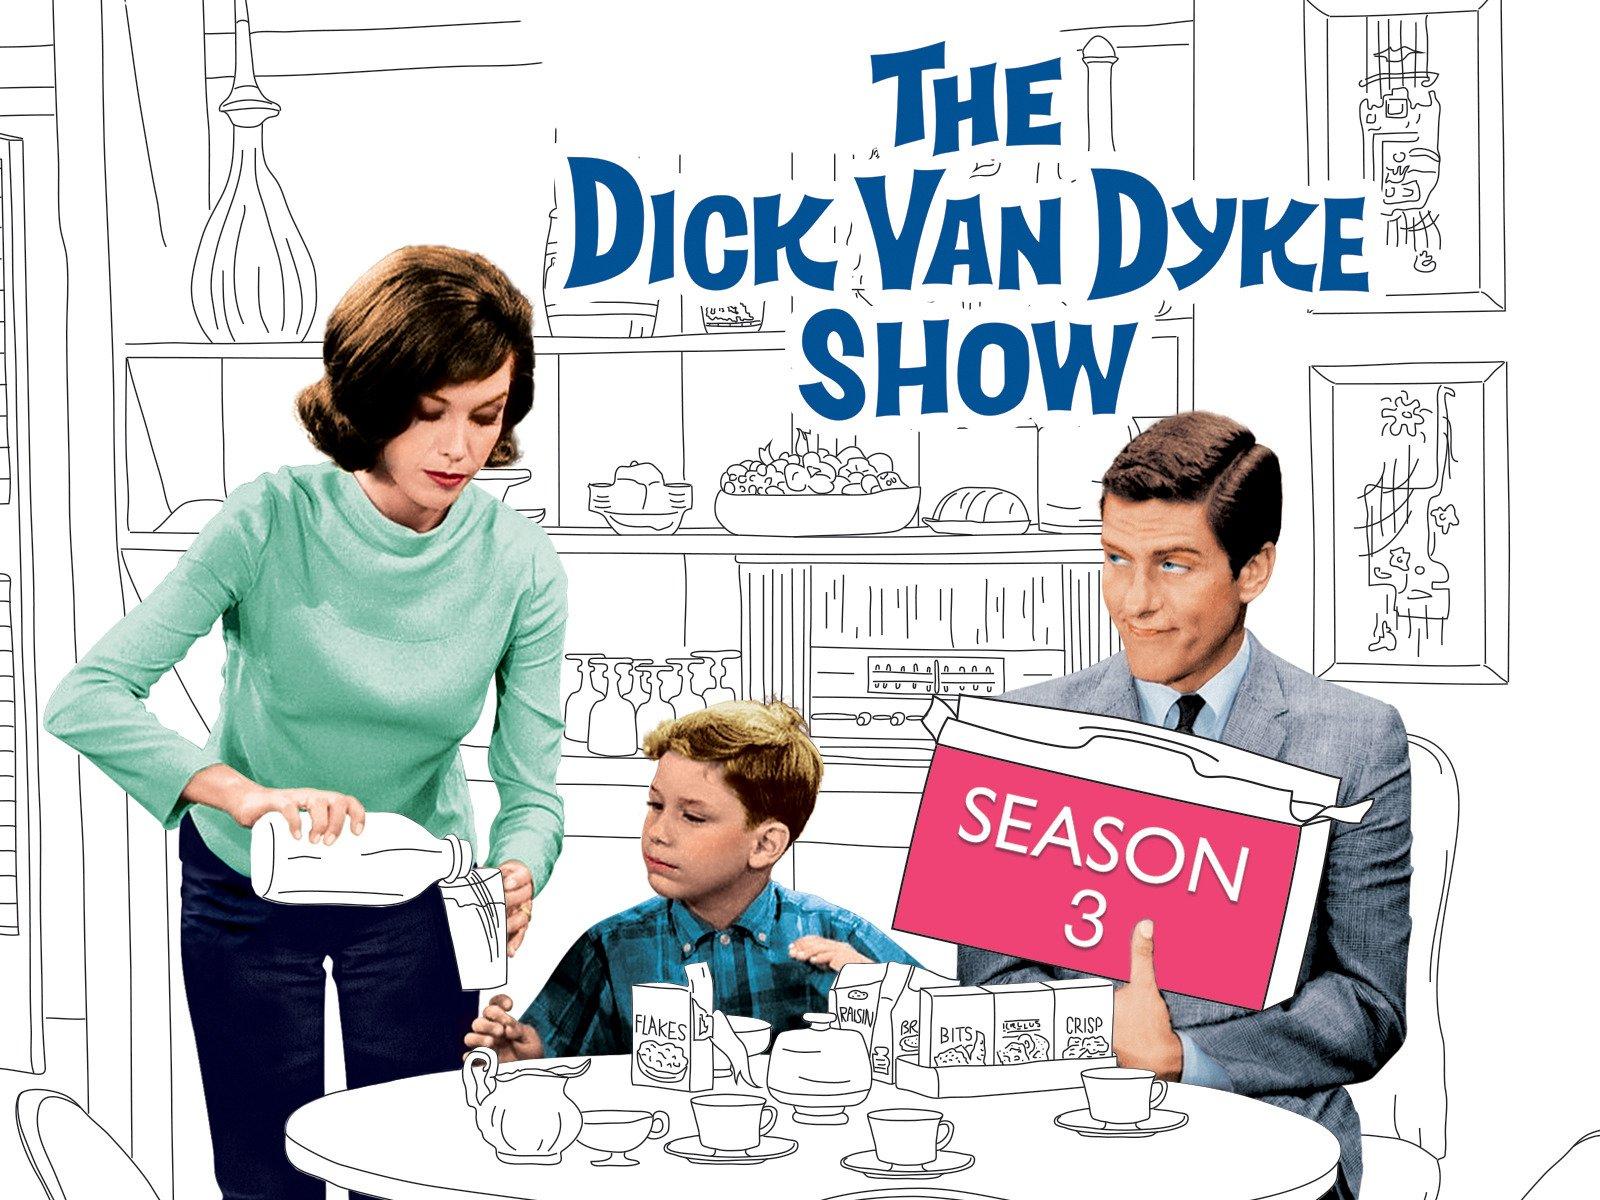 The Dick Van Dyke Show - Season 3